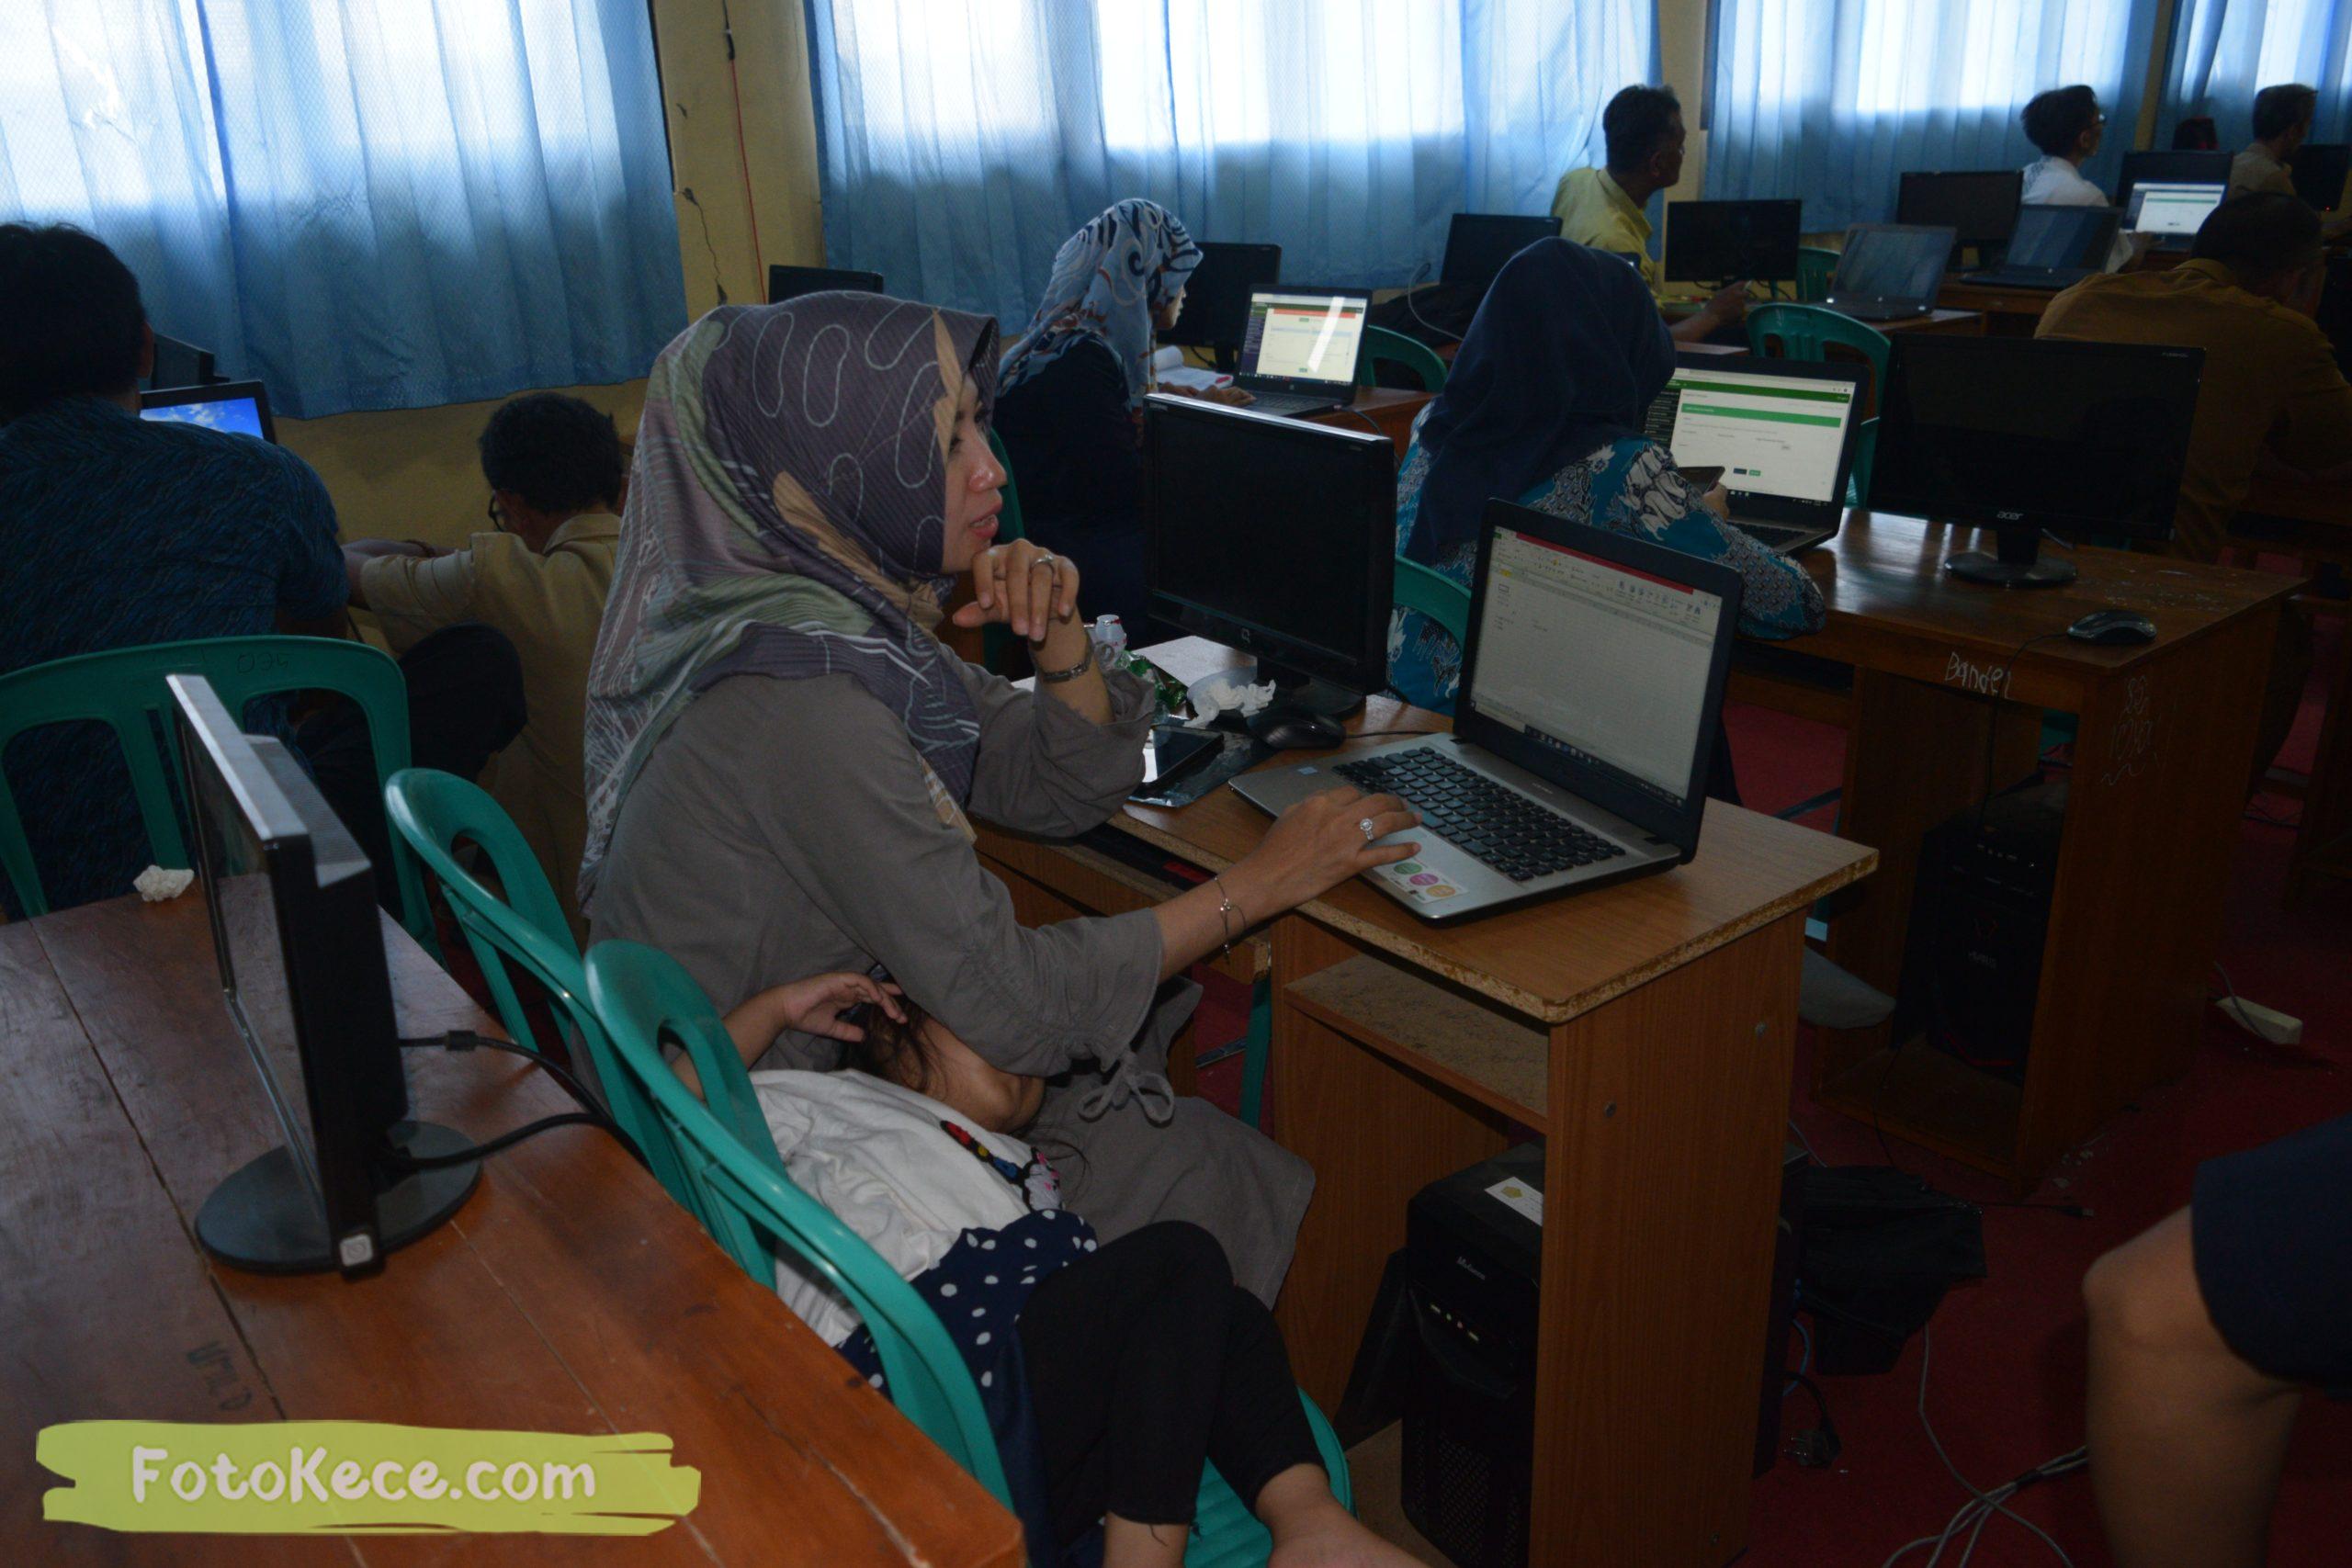 bimbingan teknis sieka 2020 bersama Bpk Abdul Aziz 08012020 fotokece 18 scaled